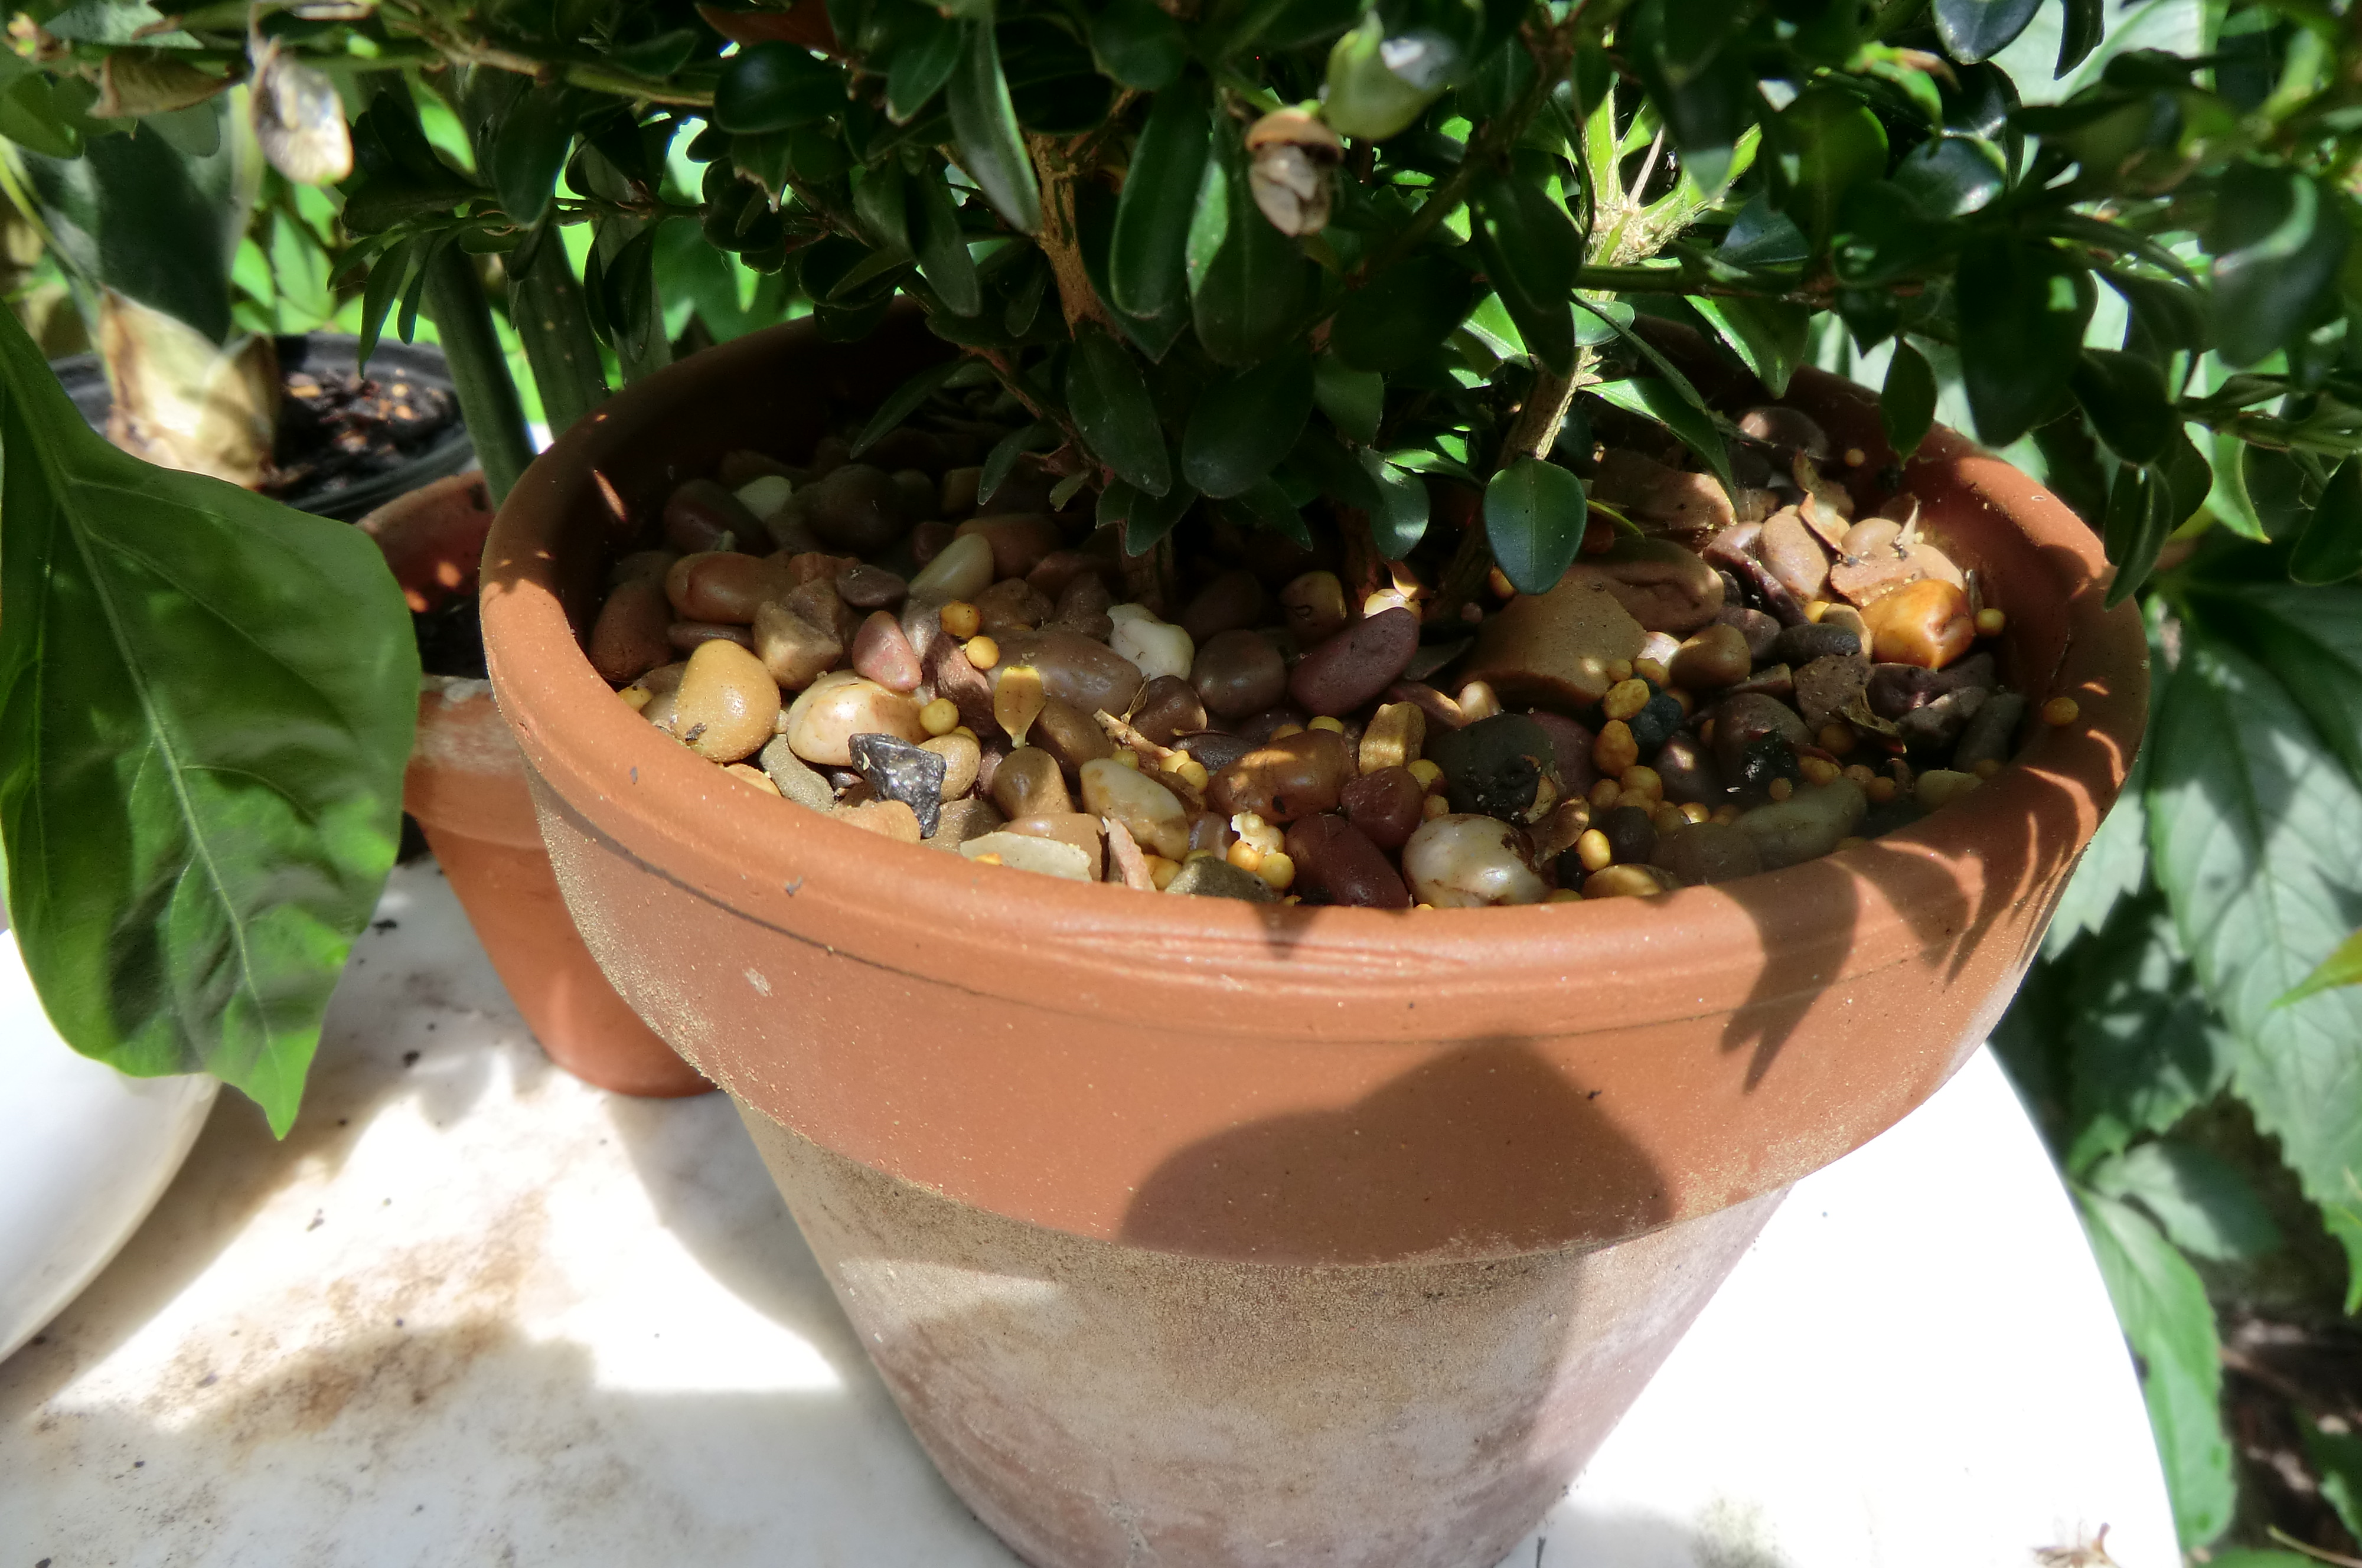 Rain in the UK: 5 ways to prepare your garden for the next heatwave